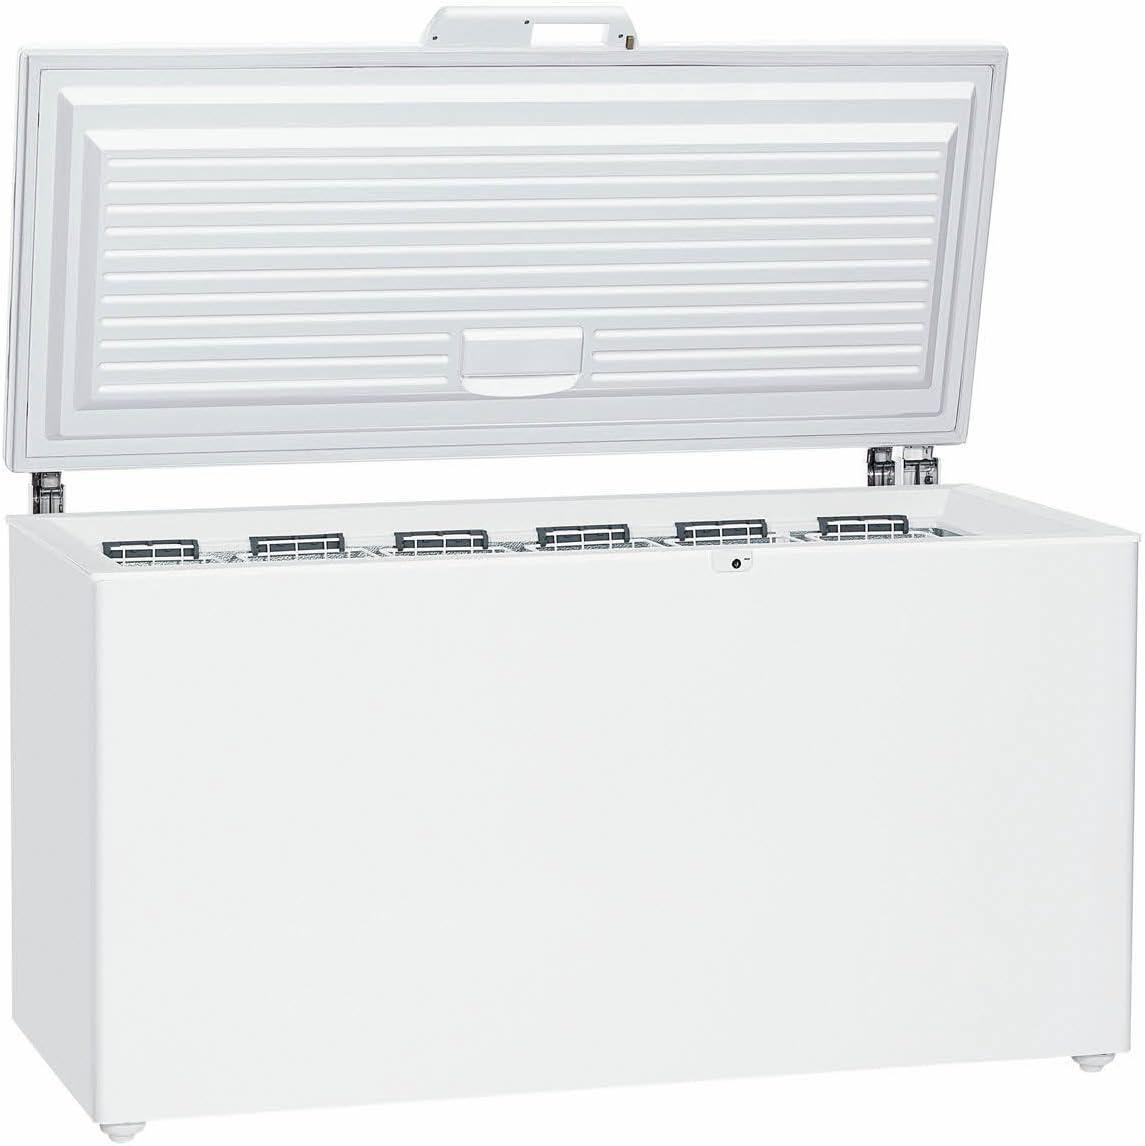 Liebherr GTP 4656 Premium - Congelador Horizontal Gtp4656 Con ...